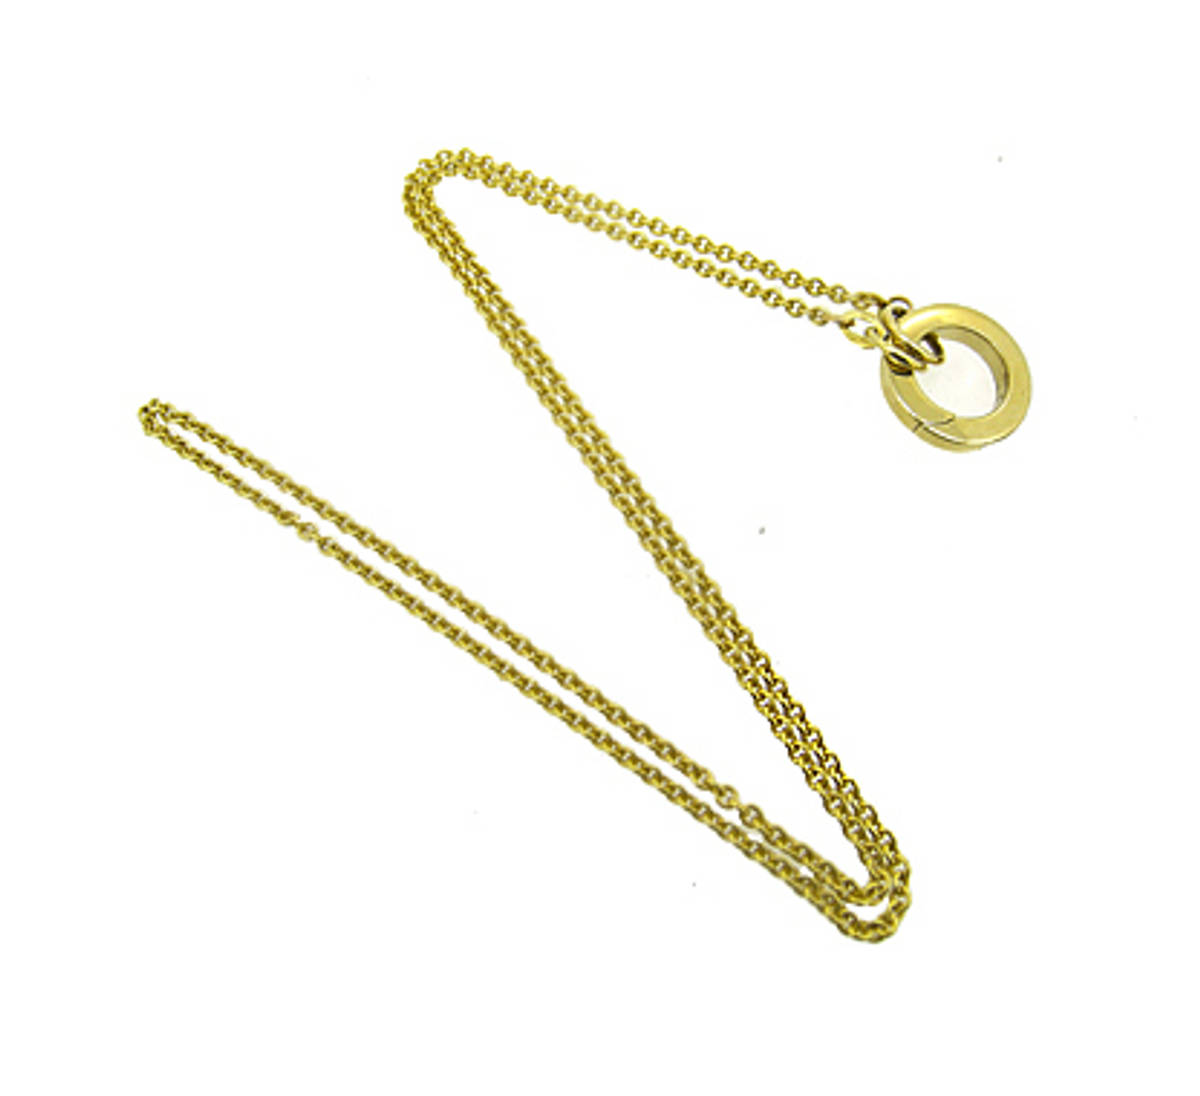 9 carat Gold Necklace